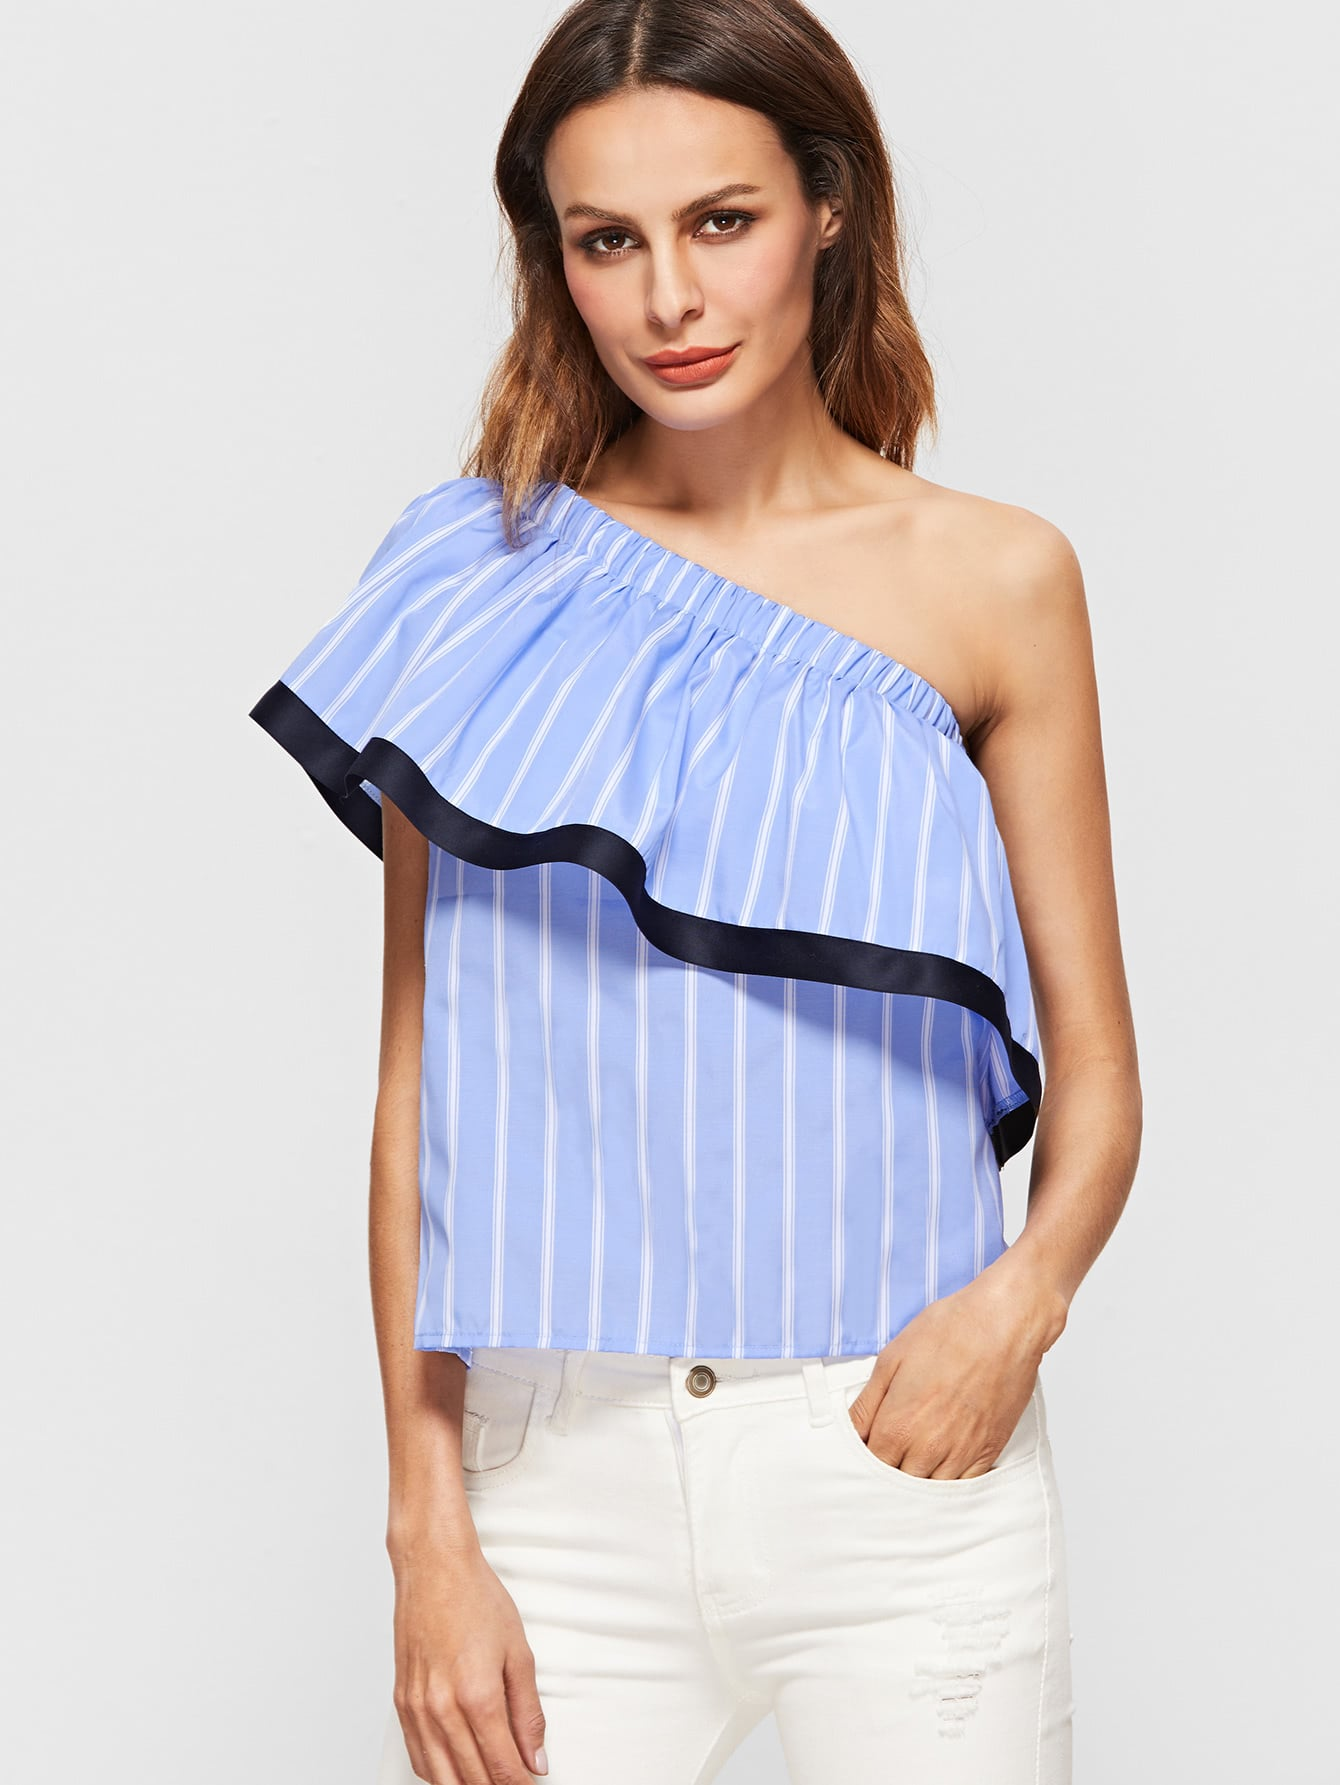 blouse161208707_2